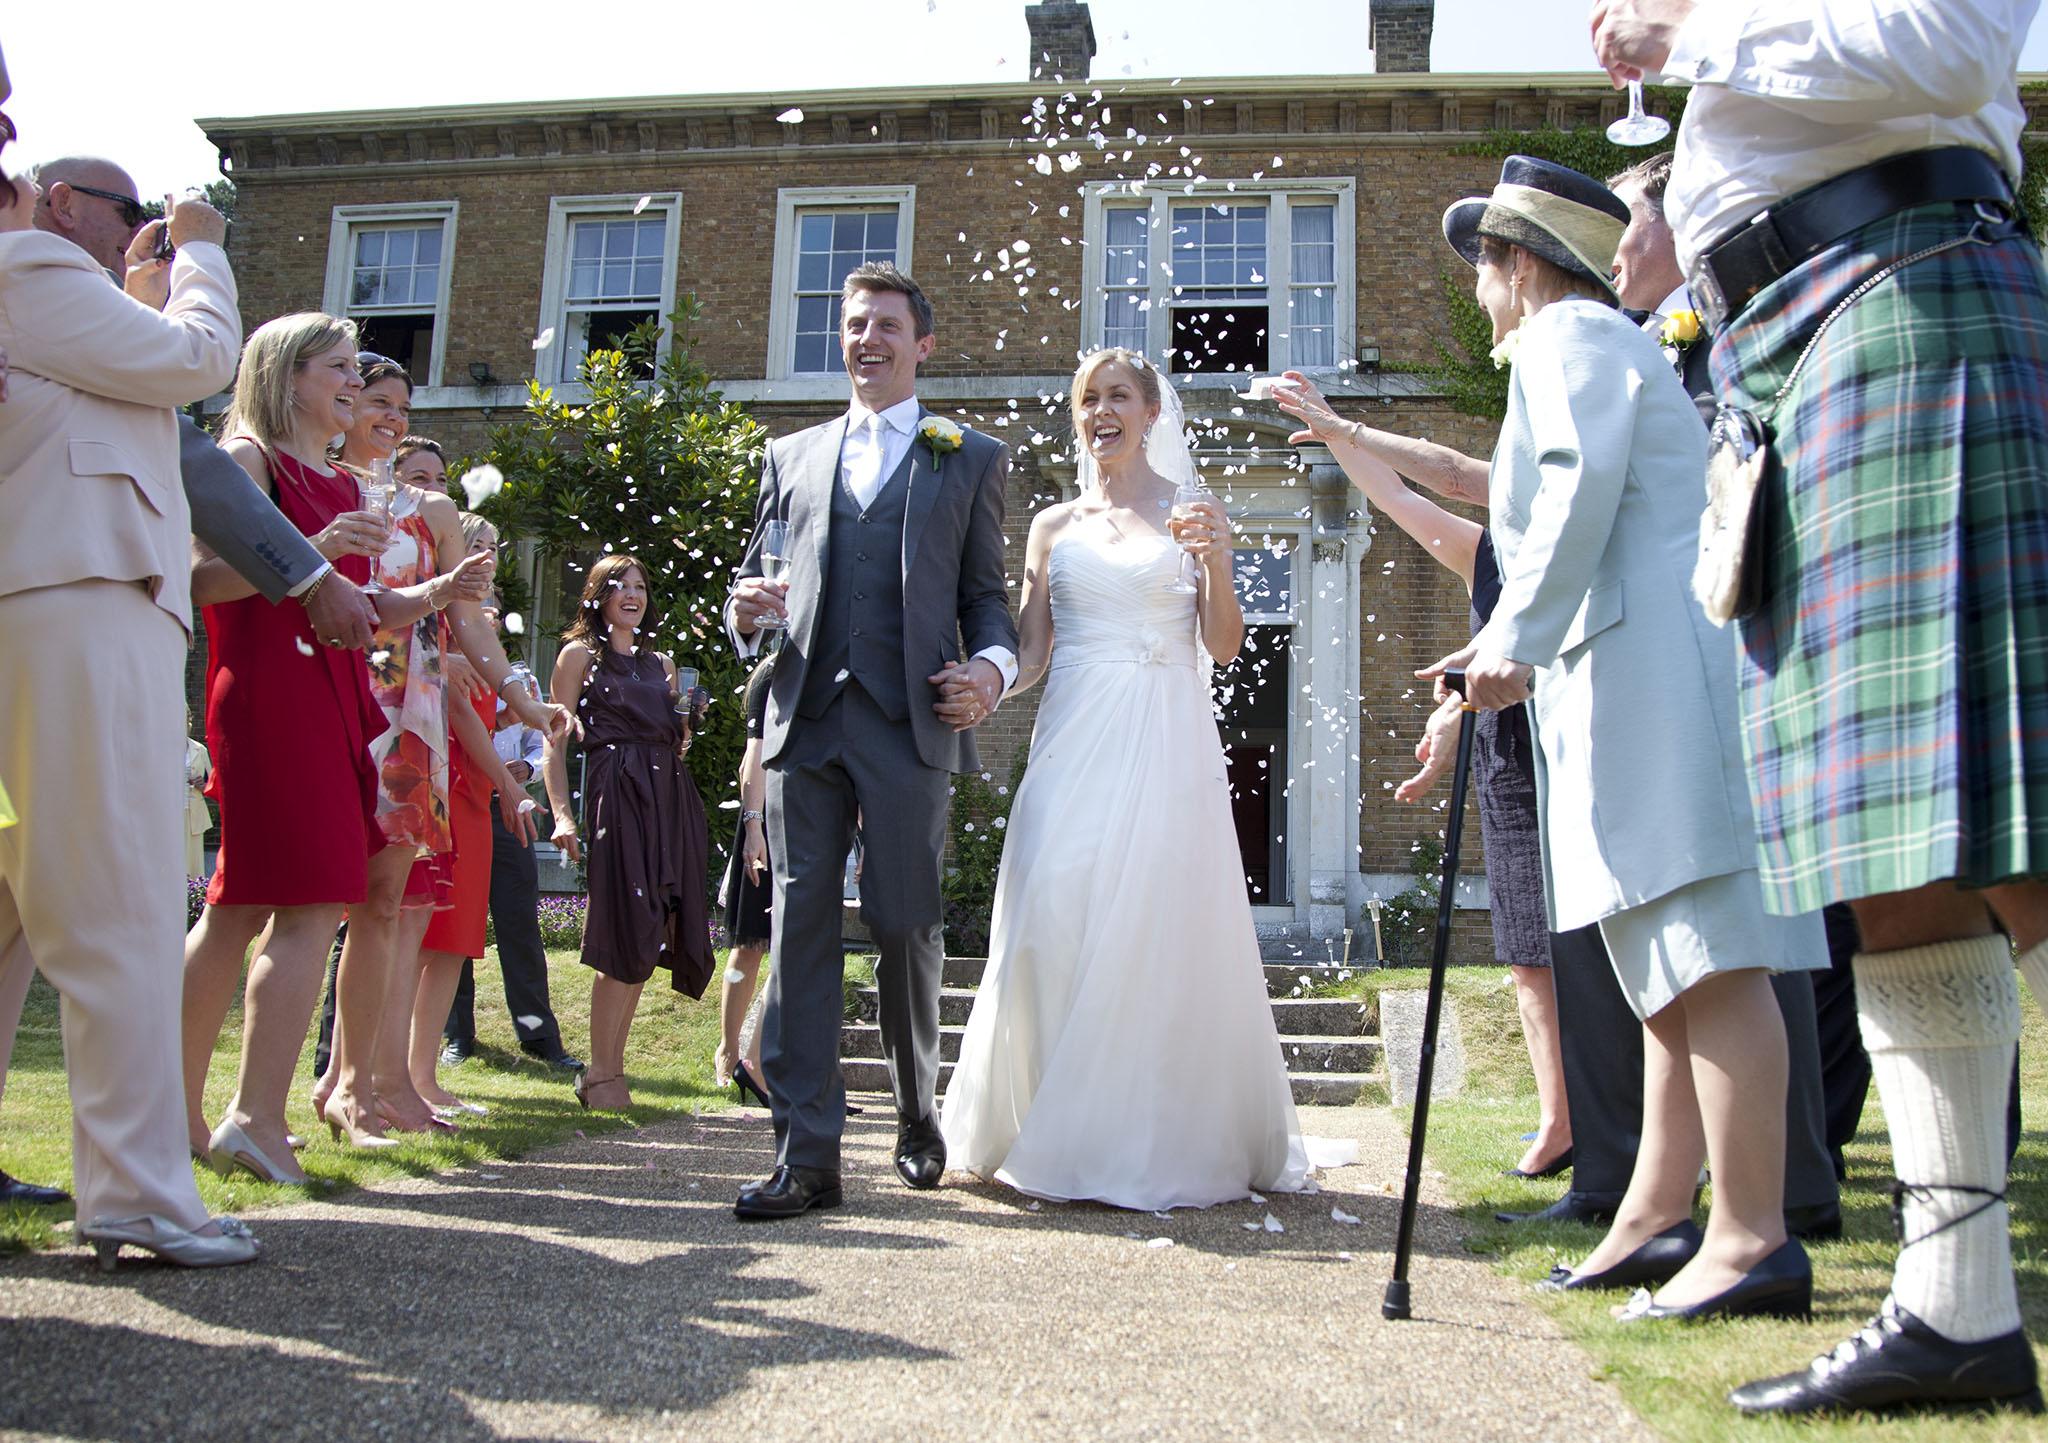 elizabethg_fineart_photography_hertfordshire_rachel_adam_wedding_highelmsmanor_41.jpg